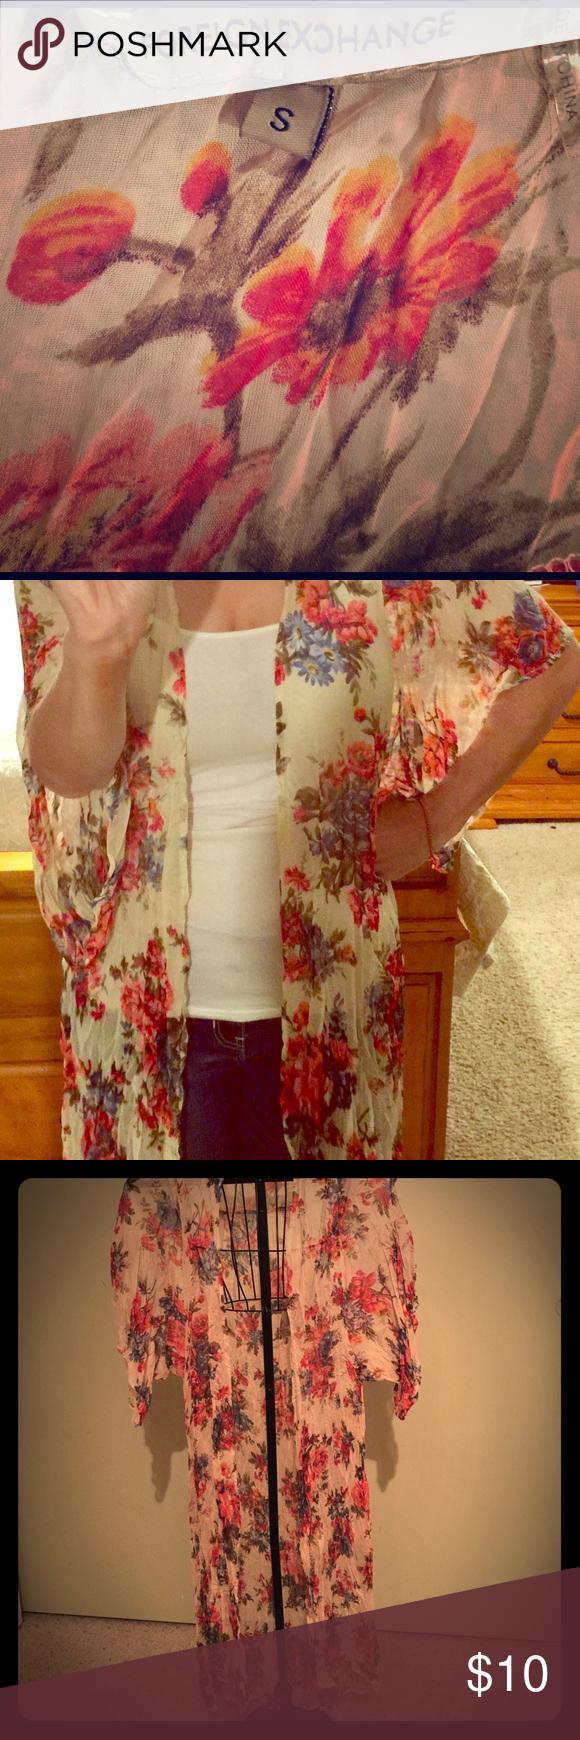 Beautiful long flower kimono. Like new. Worn a few times. Foreign Exchange Jackets & Coats Vests